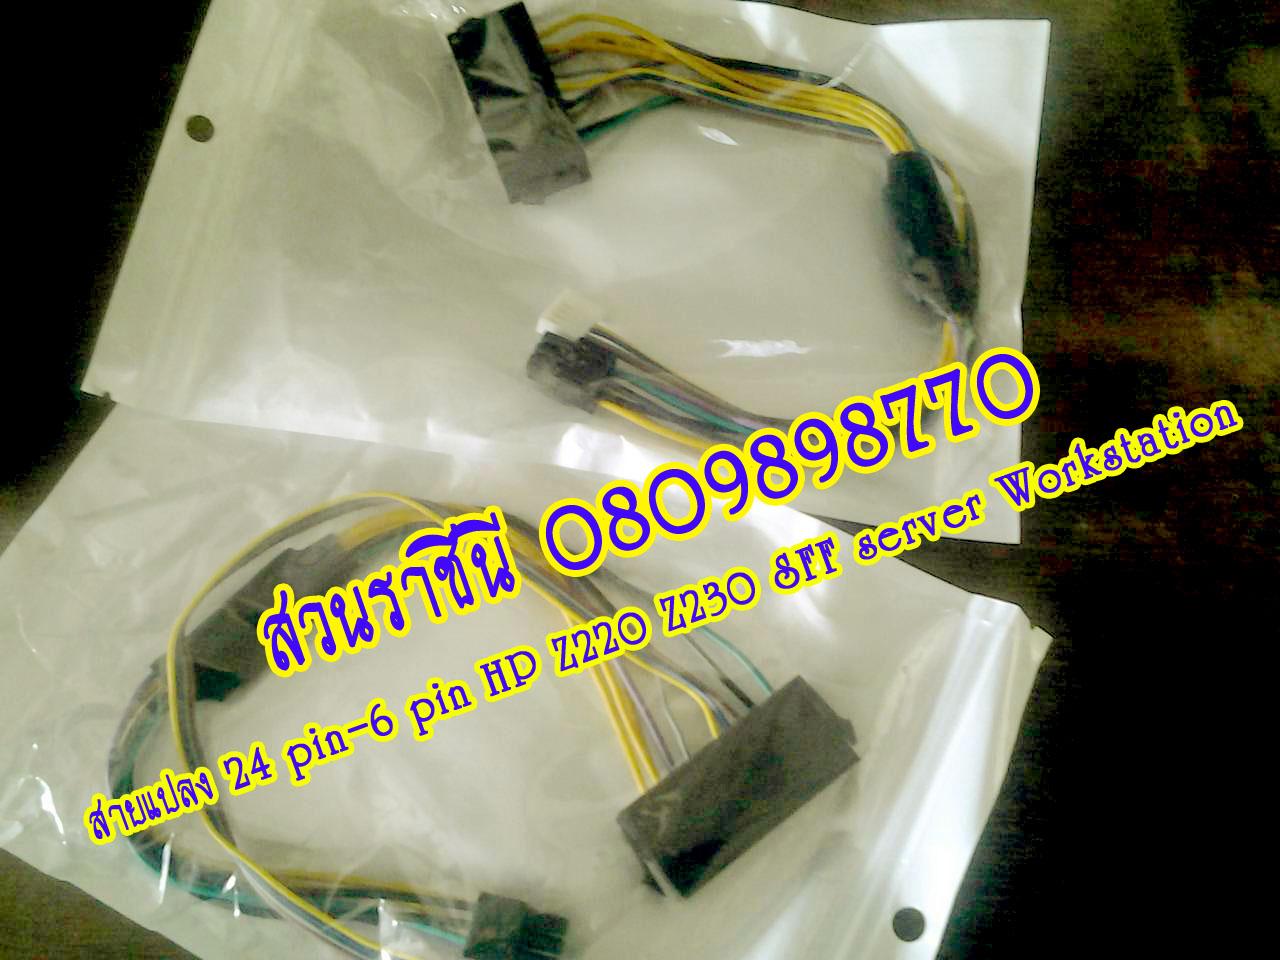 Power Supply : 24 Pin to 6 Pin PCI-E ATX -สายแปลง 24 pin-6